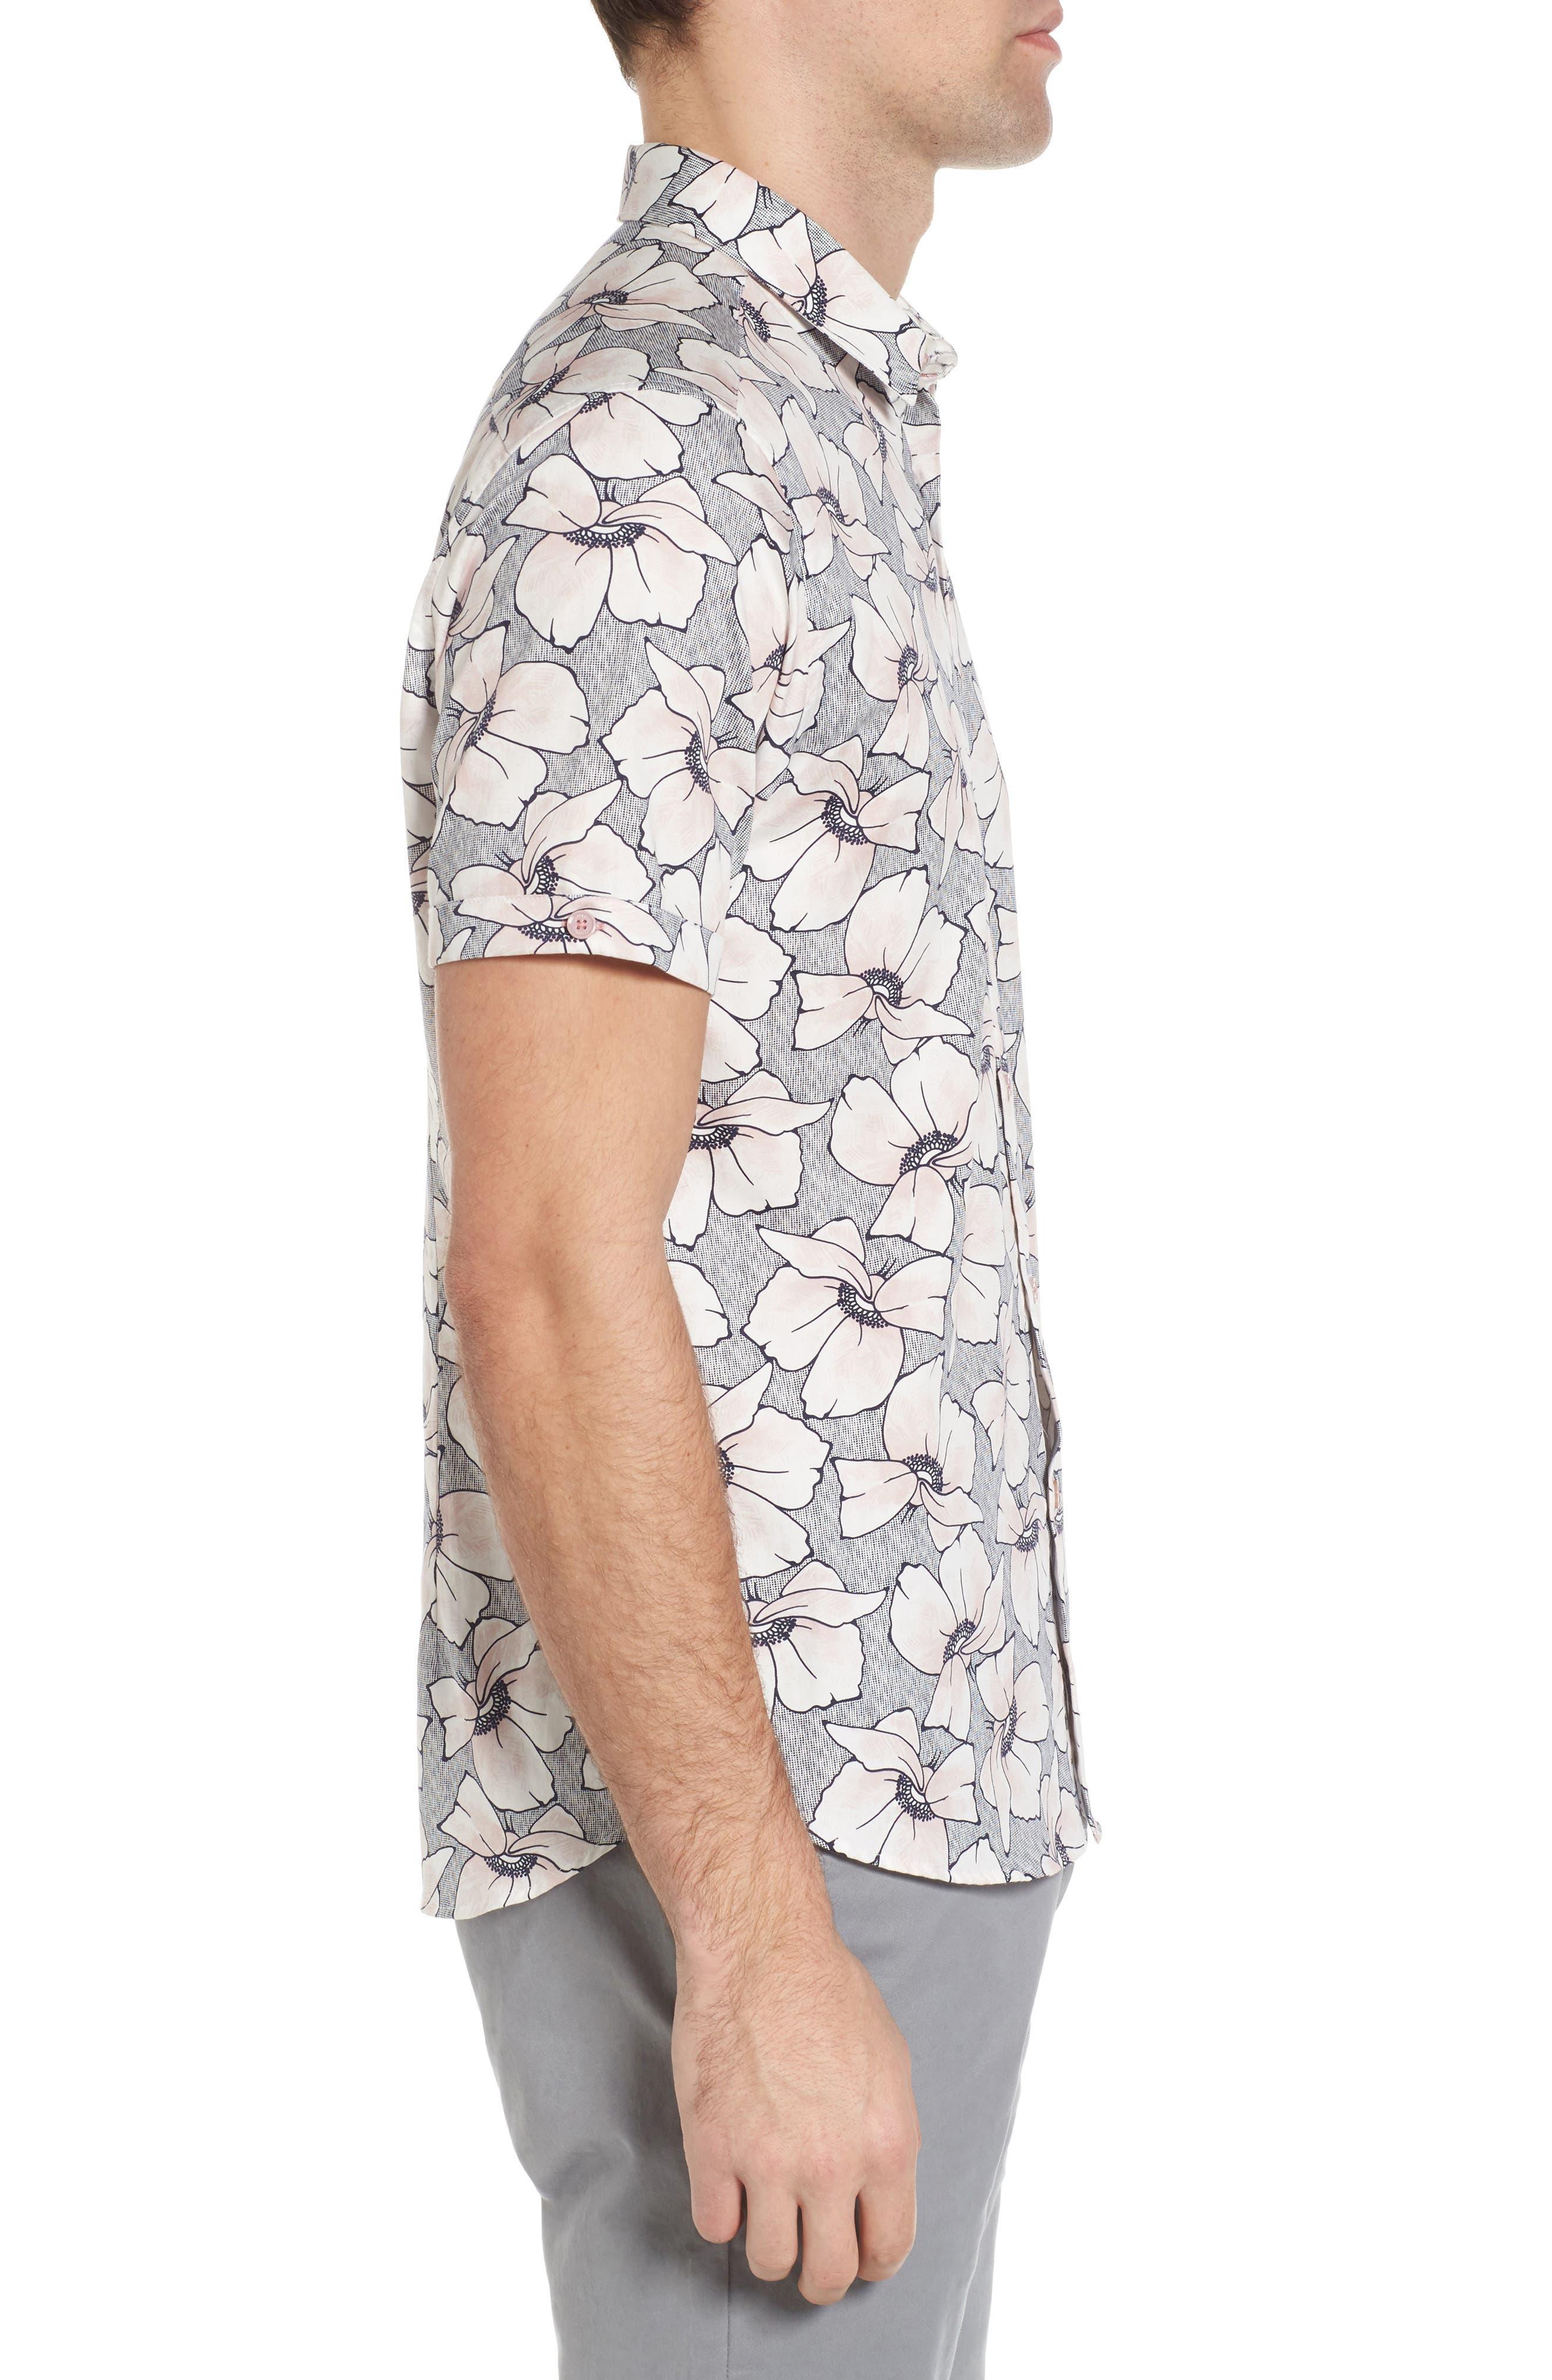 TED BAKER LONDON,                             Bigflo Floral Short Sleeve Sport Shirt,                             Alternate thumbnail 3, color,                             683